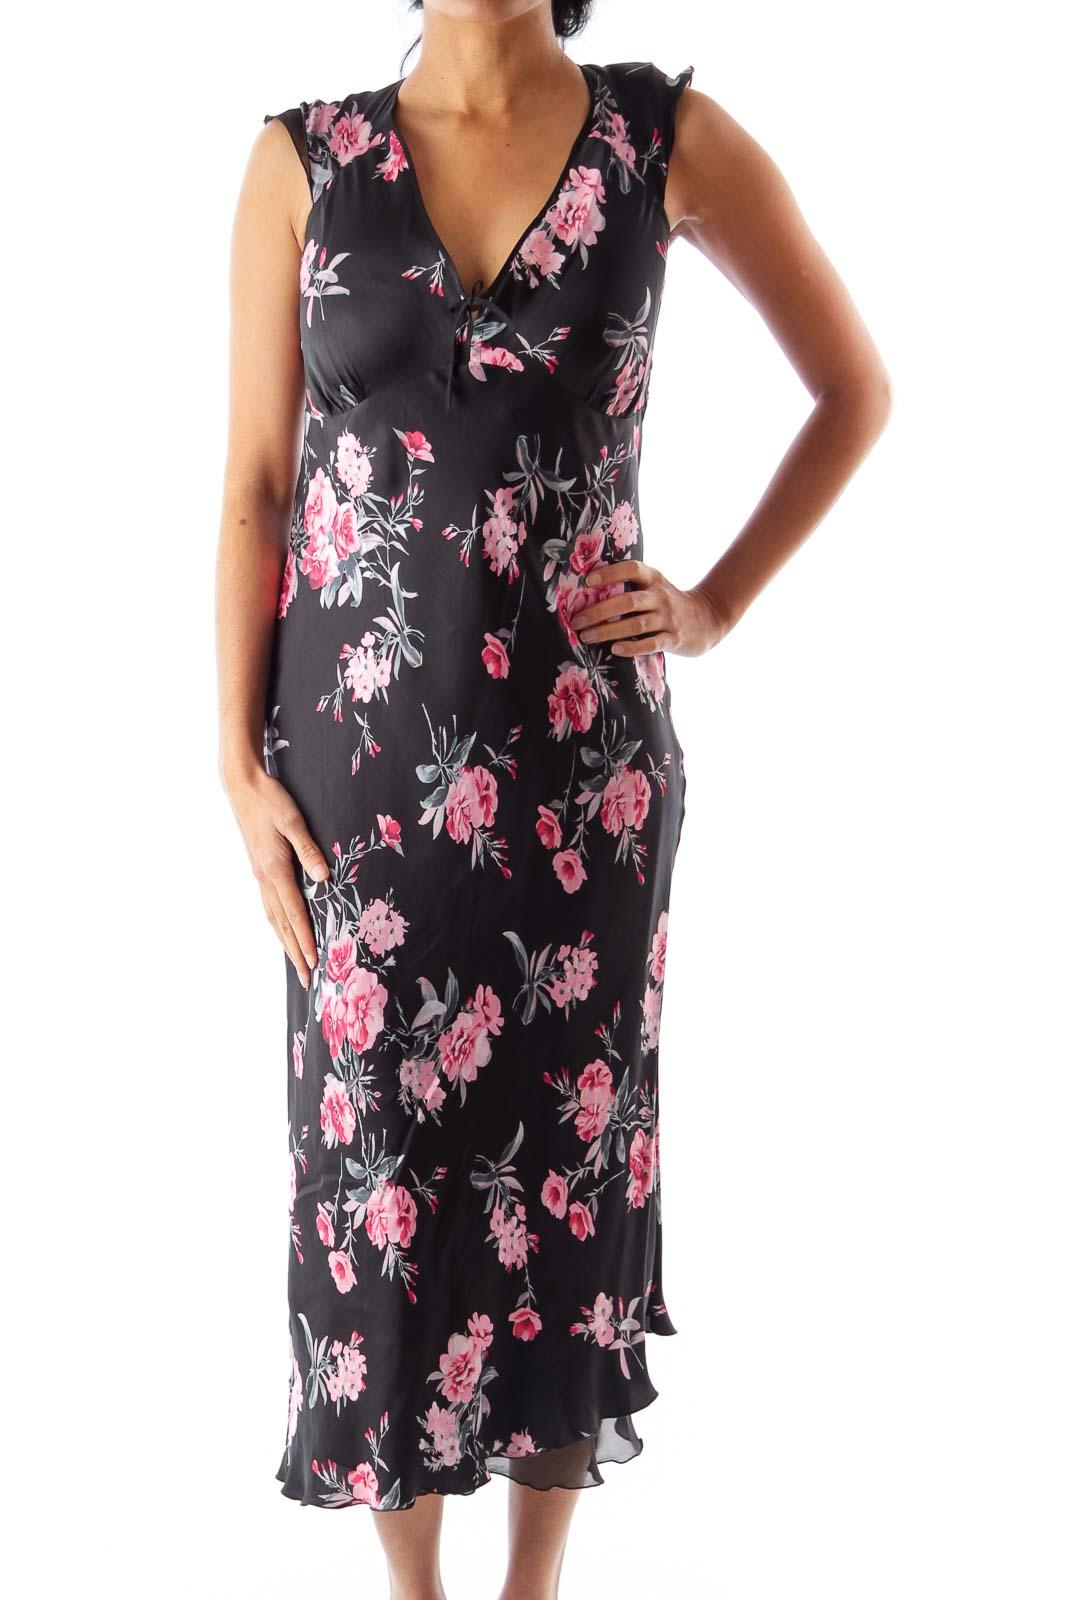 Black Floral Midi Dress Front